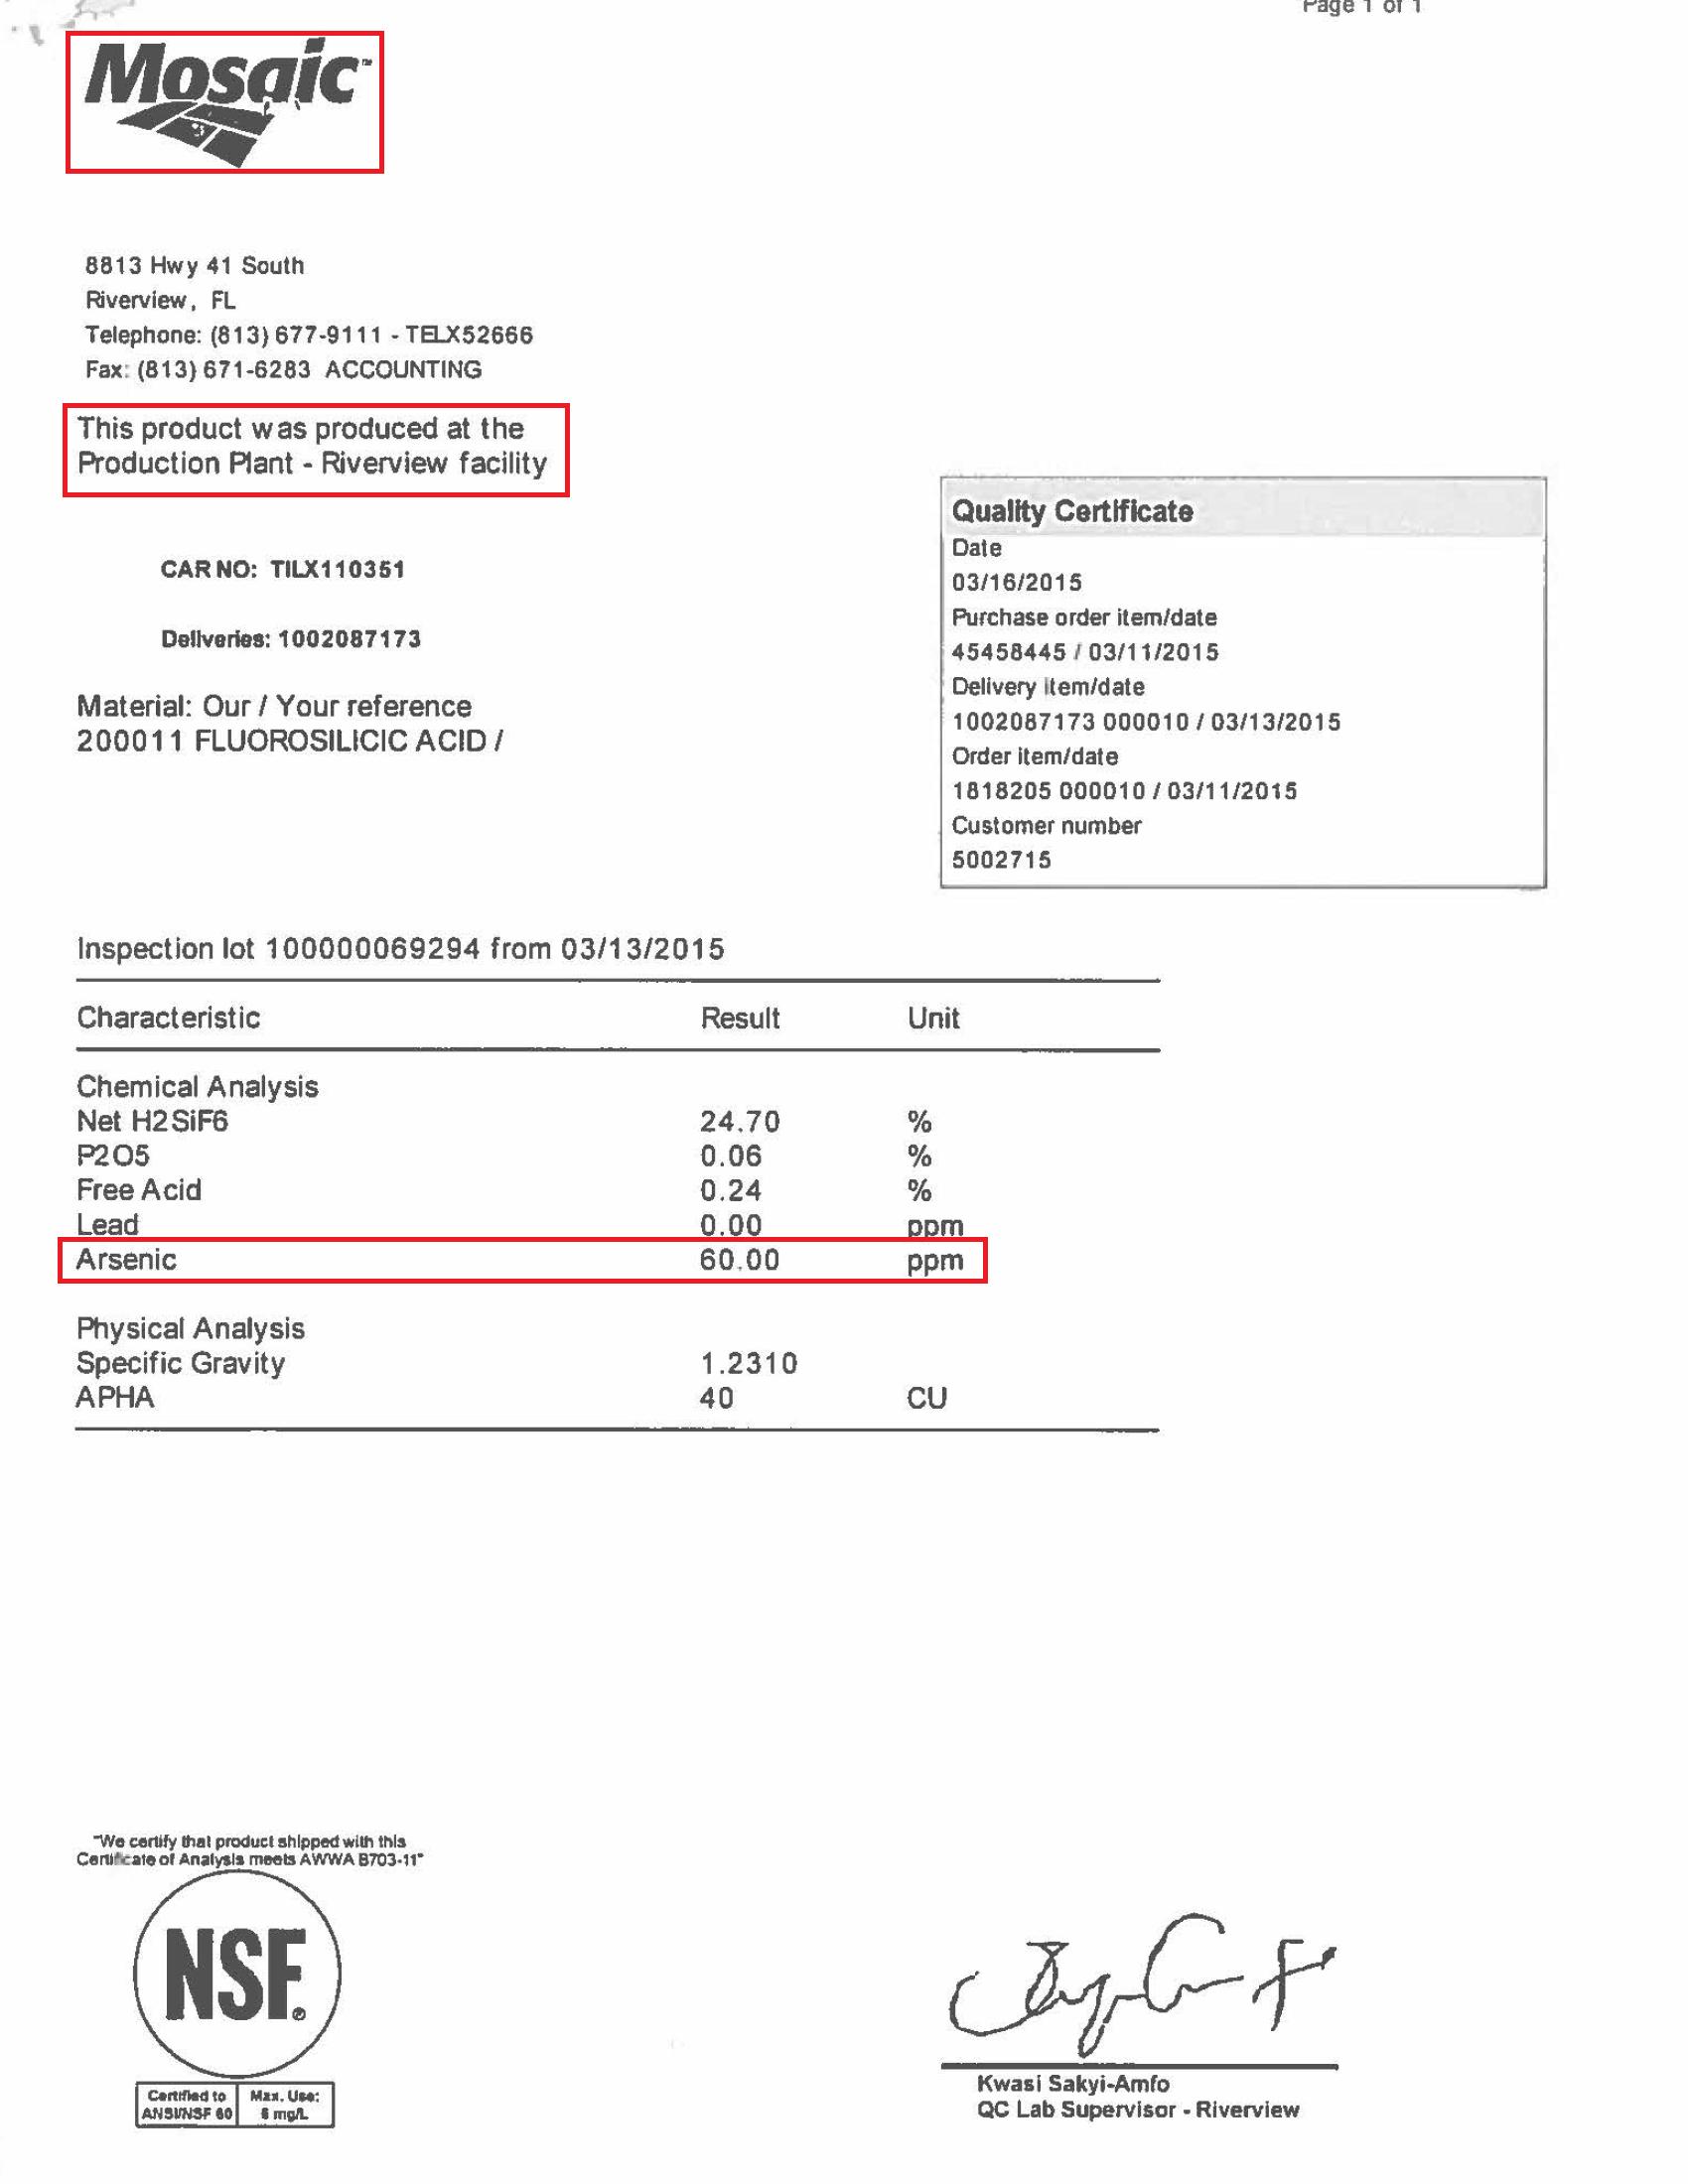 Hydrofluosilicic Acid (fluoride) purchases